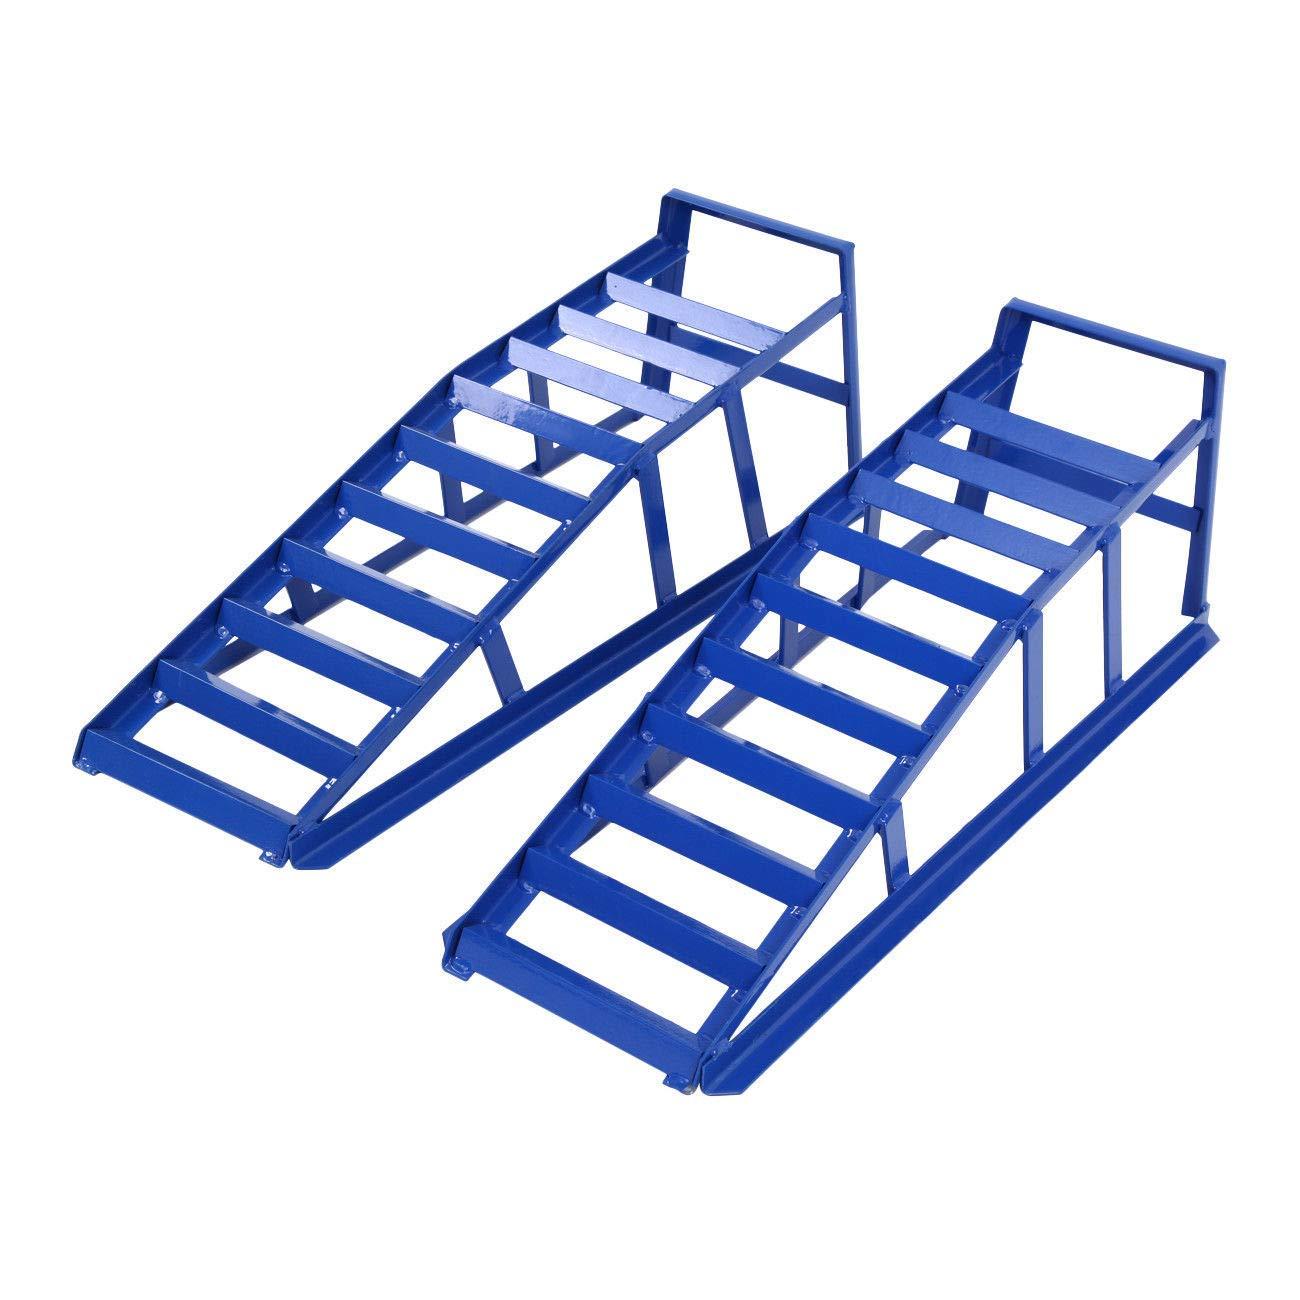 Samger 2Ton Steel Car Access Ramps Loading Ramp Heavy Duty Maintenance Lifting Equipment Blue